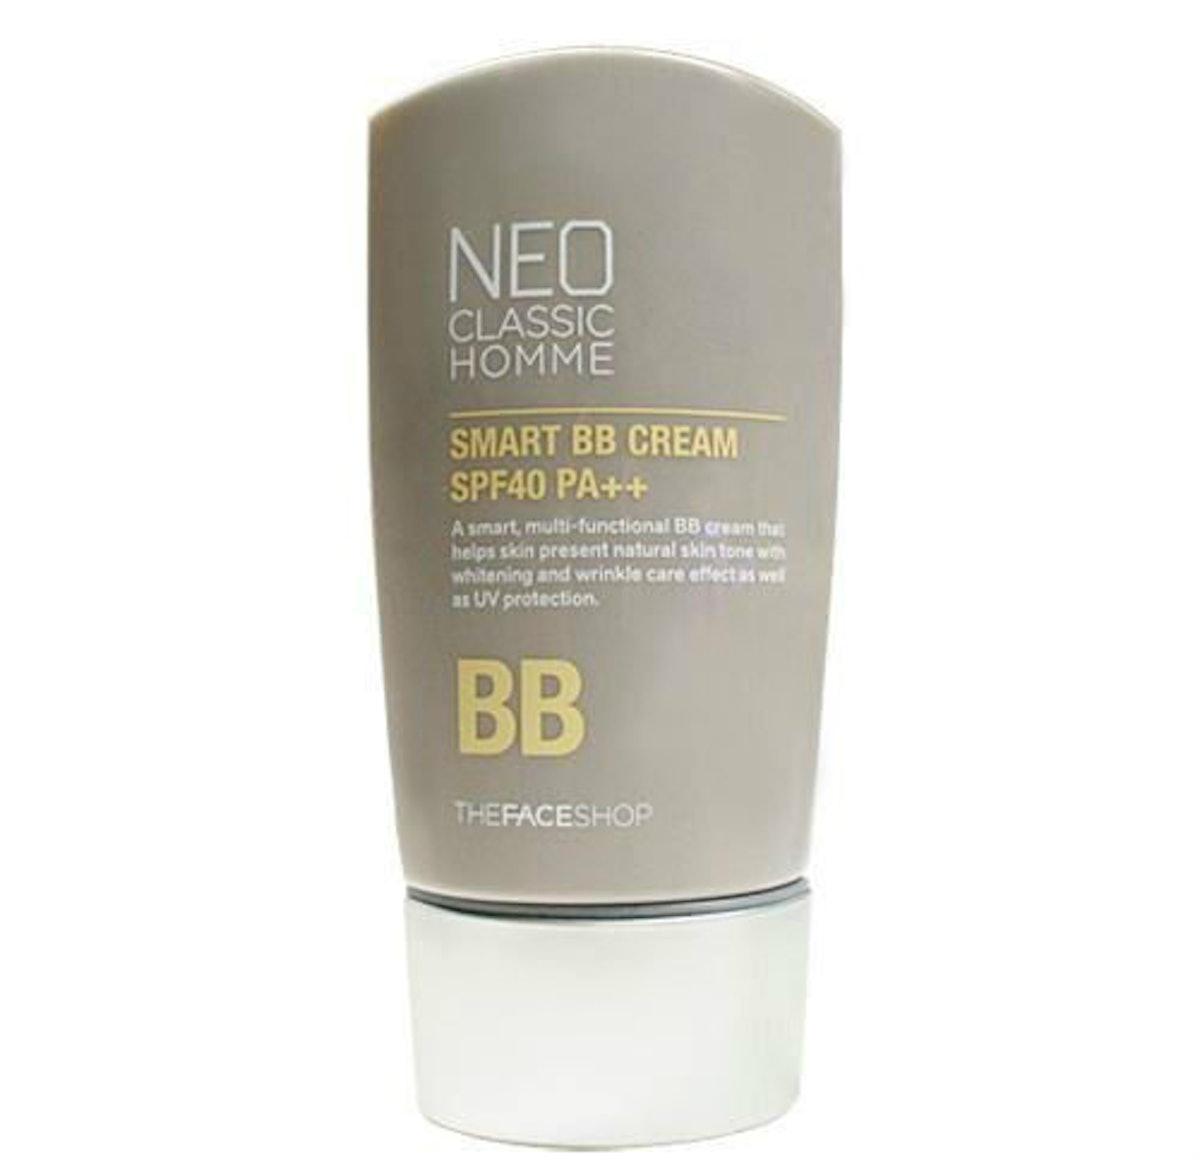 Neo Classic Homme BB Cream